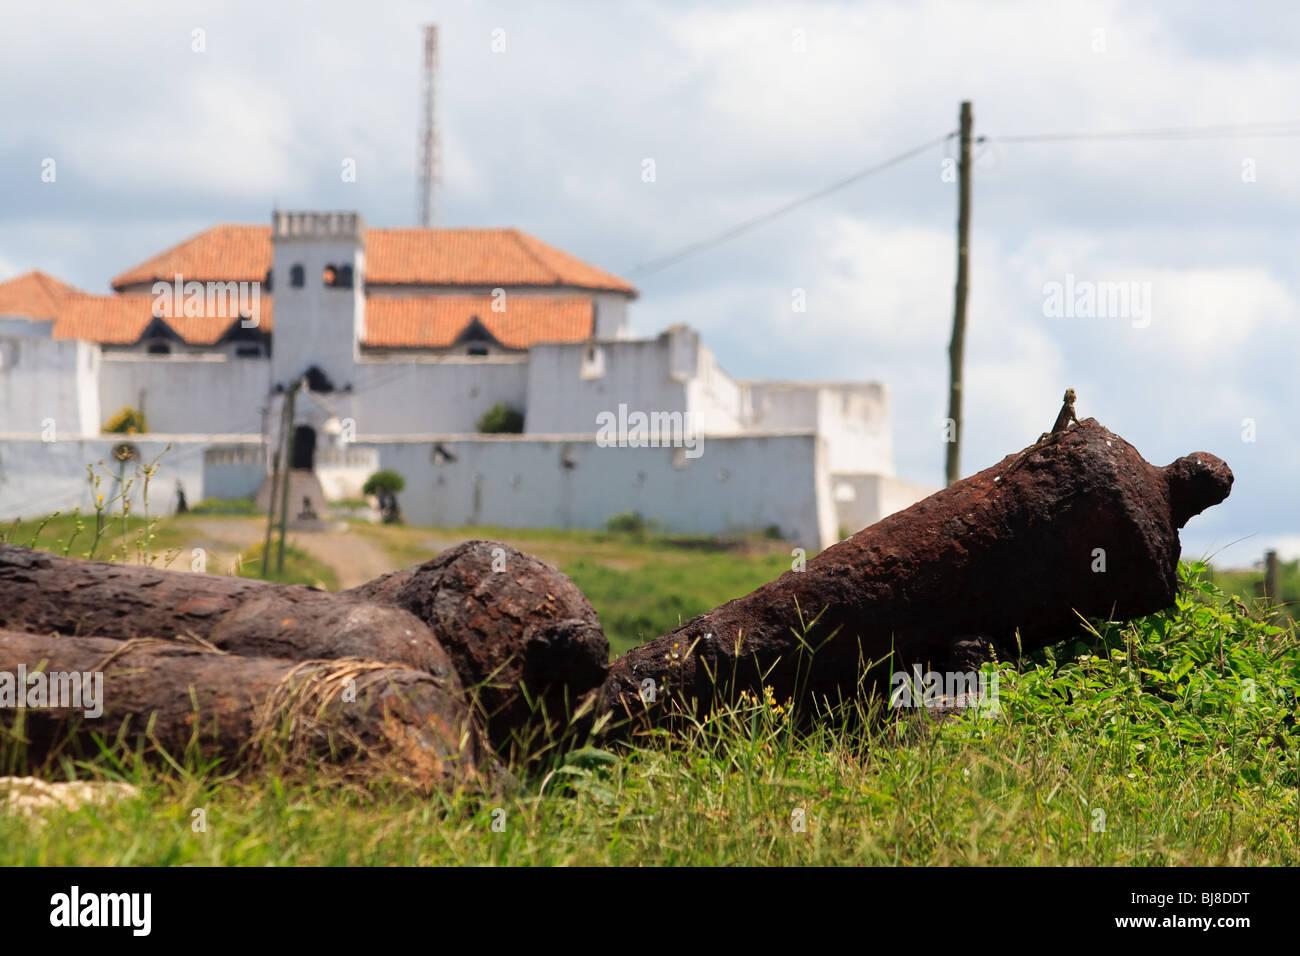 África Elmina Castle Fort Ghana paisajes Imagen De Stock